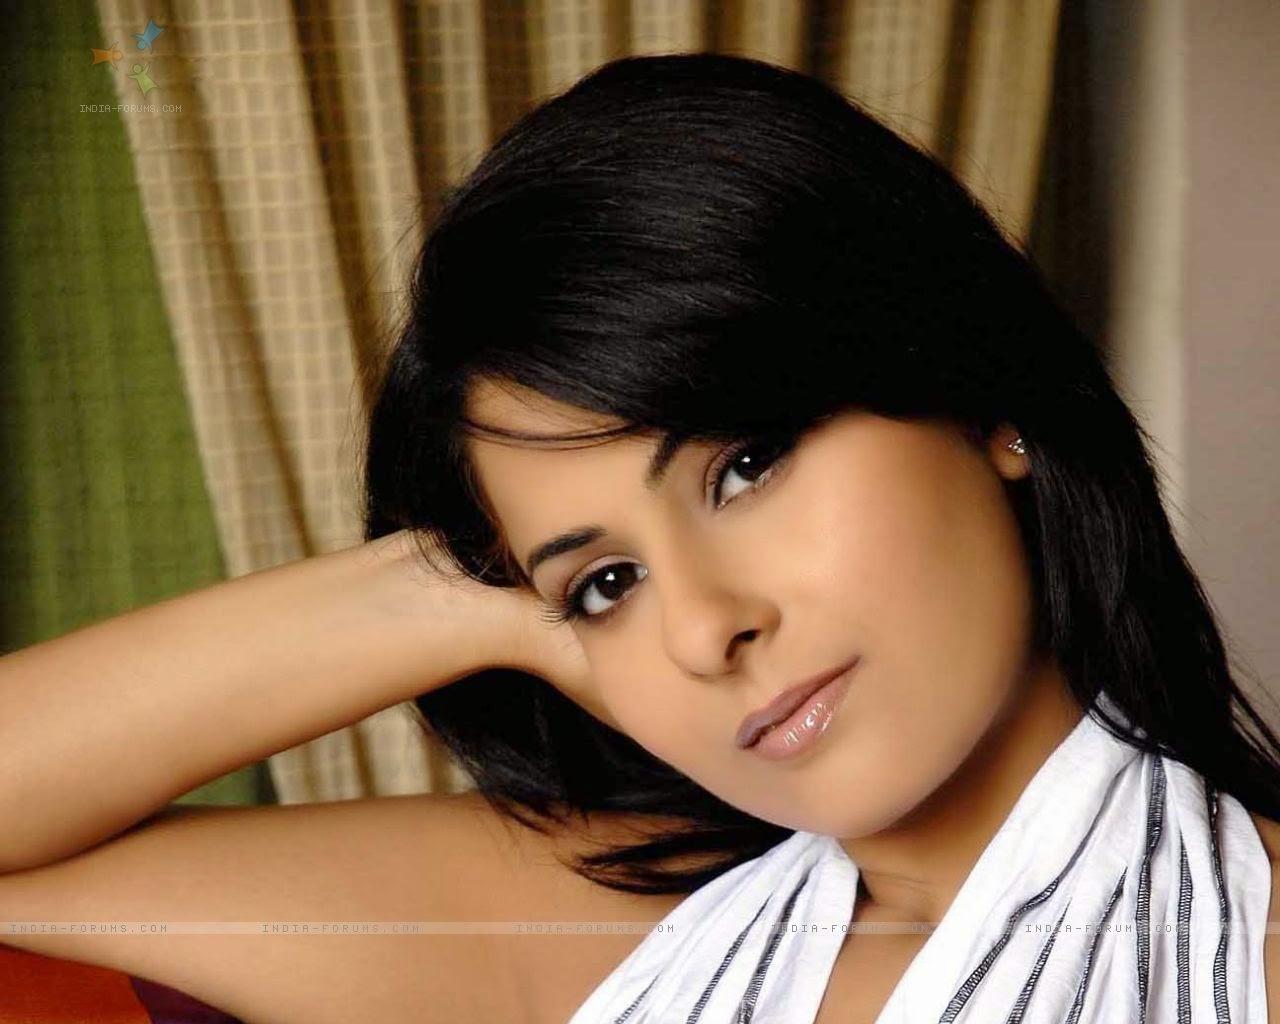 Chhavi Mittal - Chhavi Mittal Photo Gallery, Videos, Fanclub